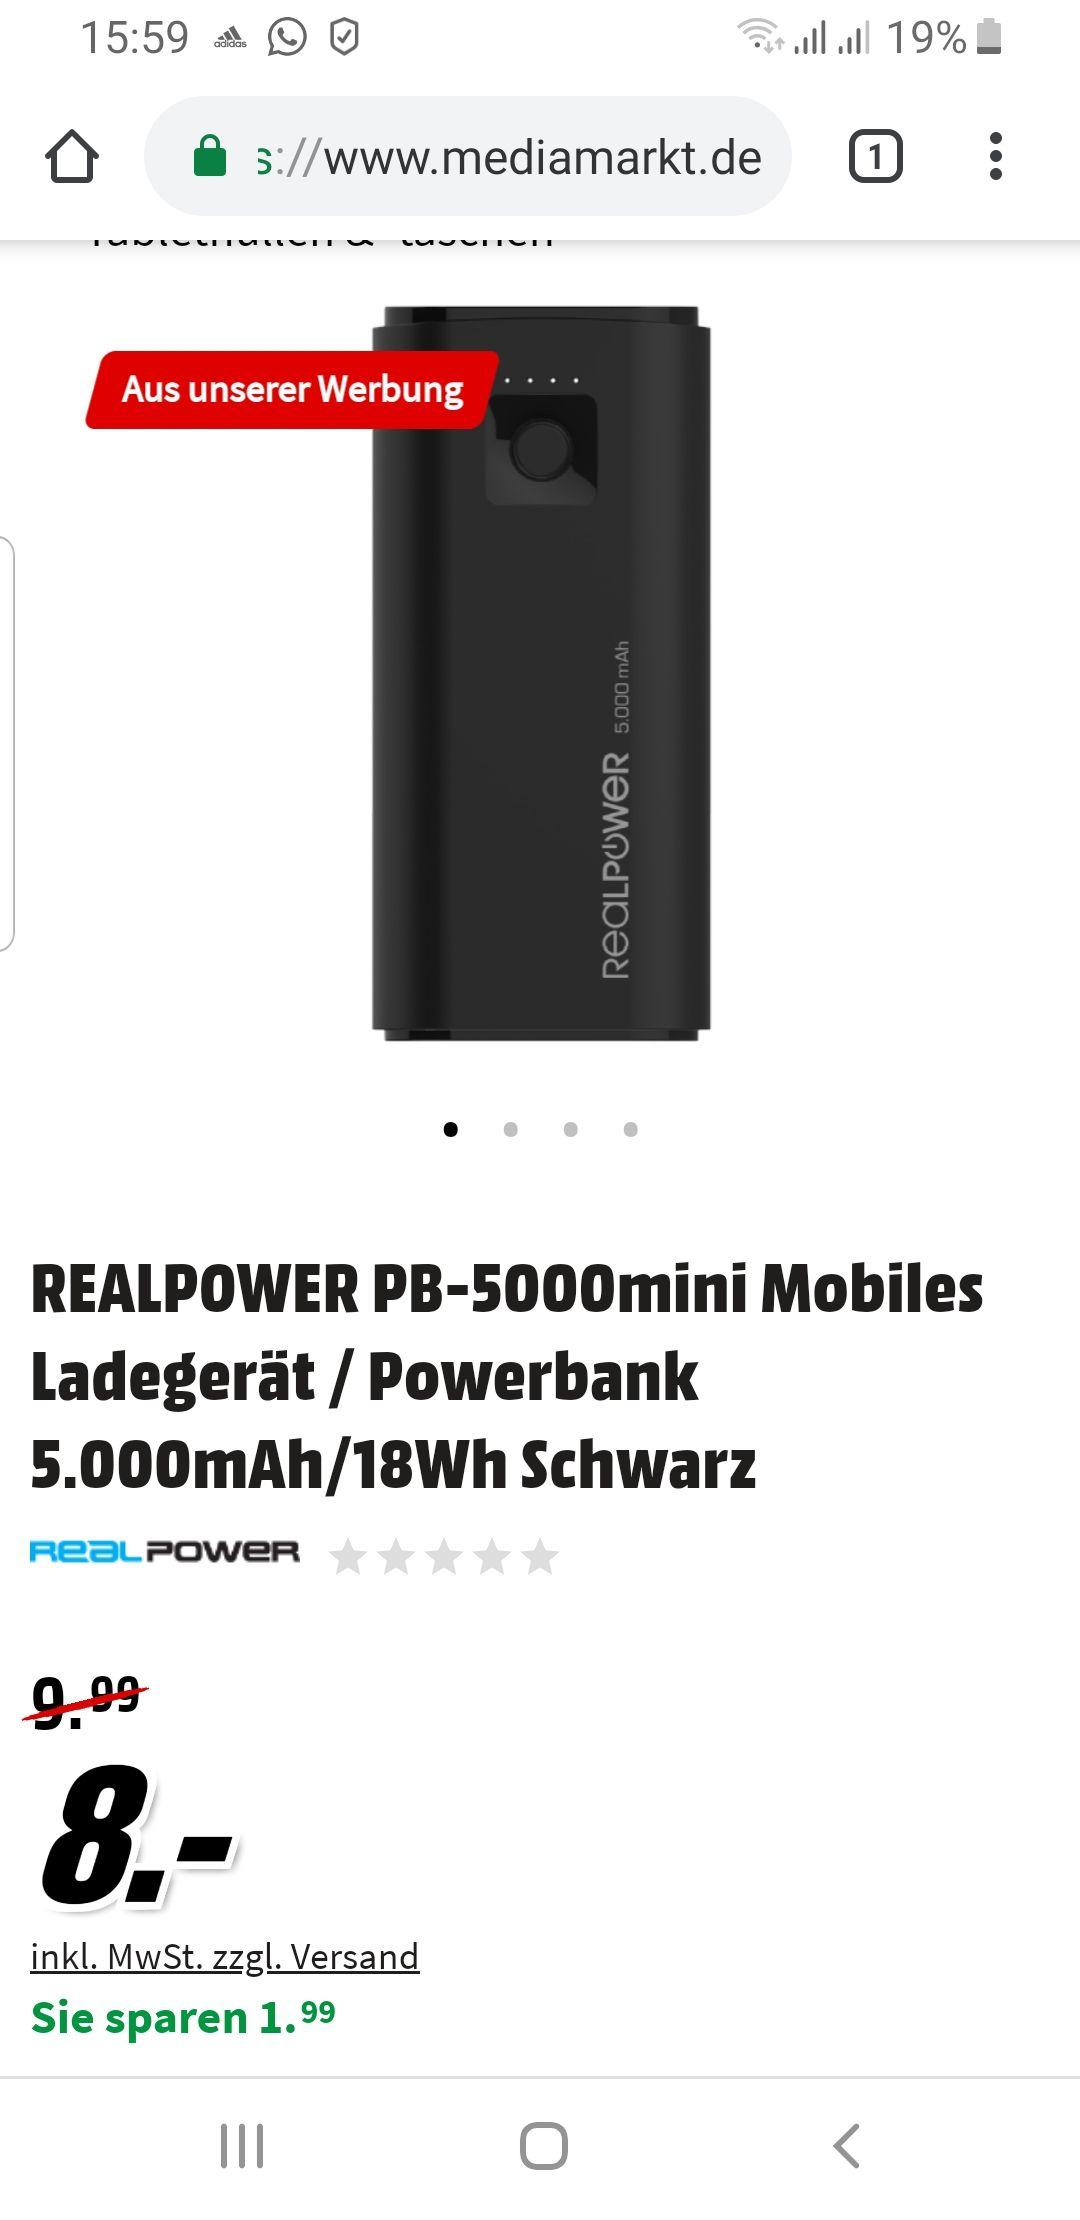 [Media Markt online]REALPOWER PB-5000mini Mobiles Ladegerät / Powerbank 5.000mAh/18Wh Schwarz